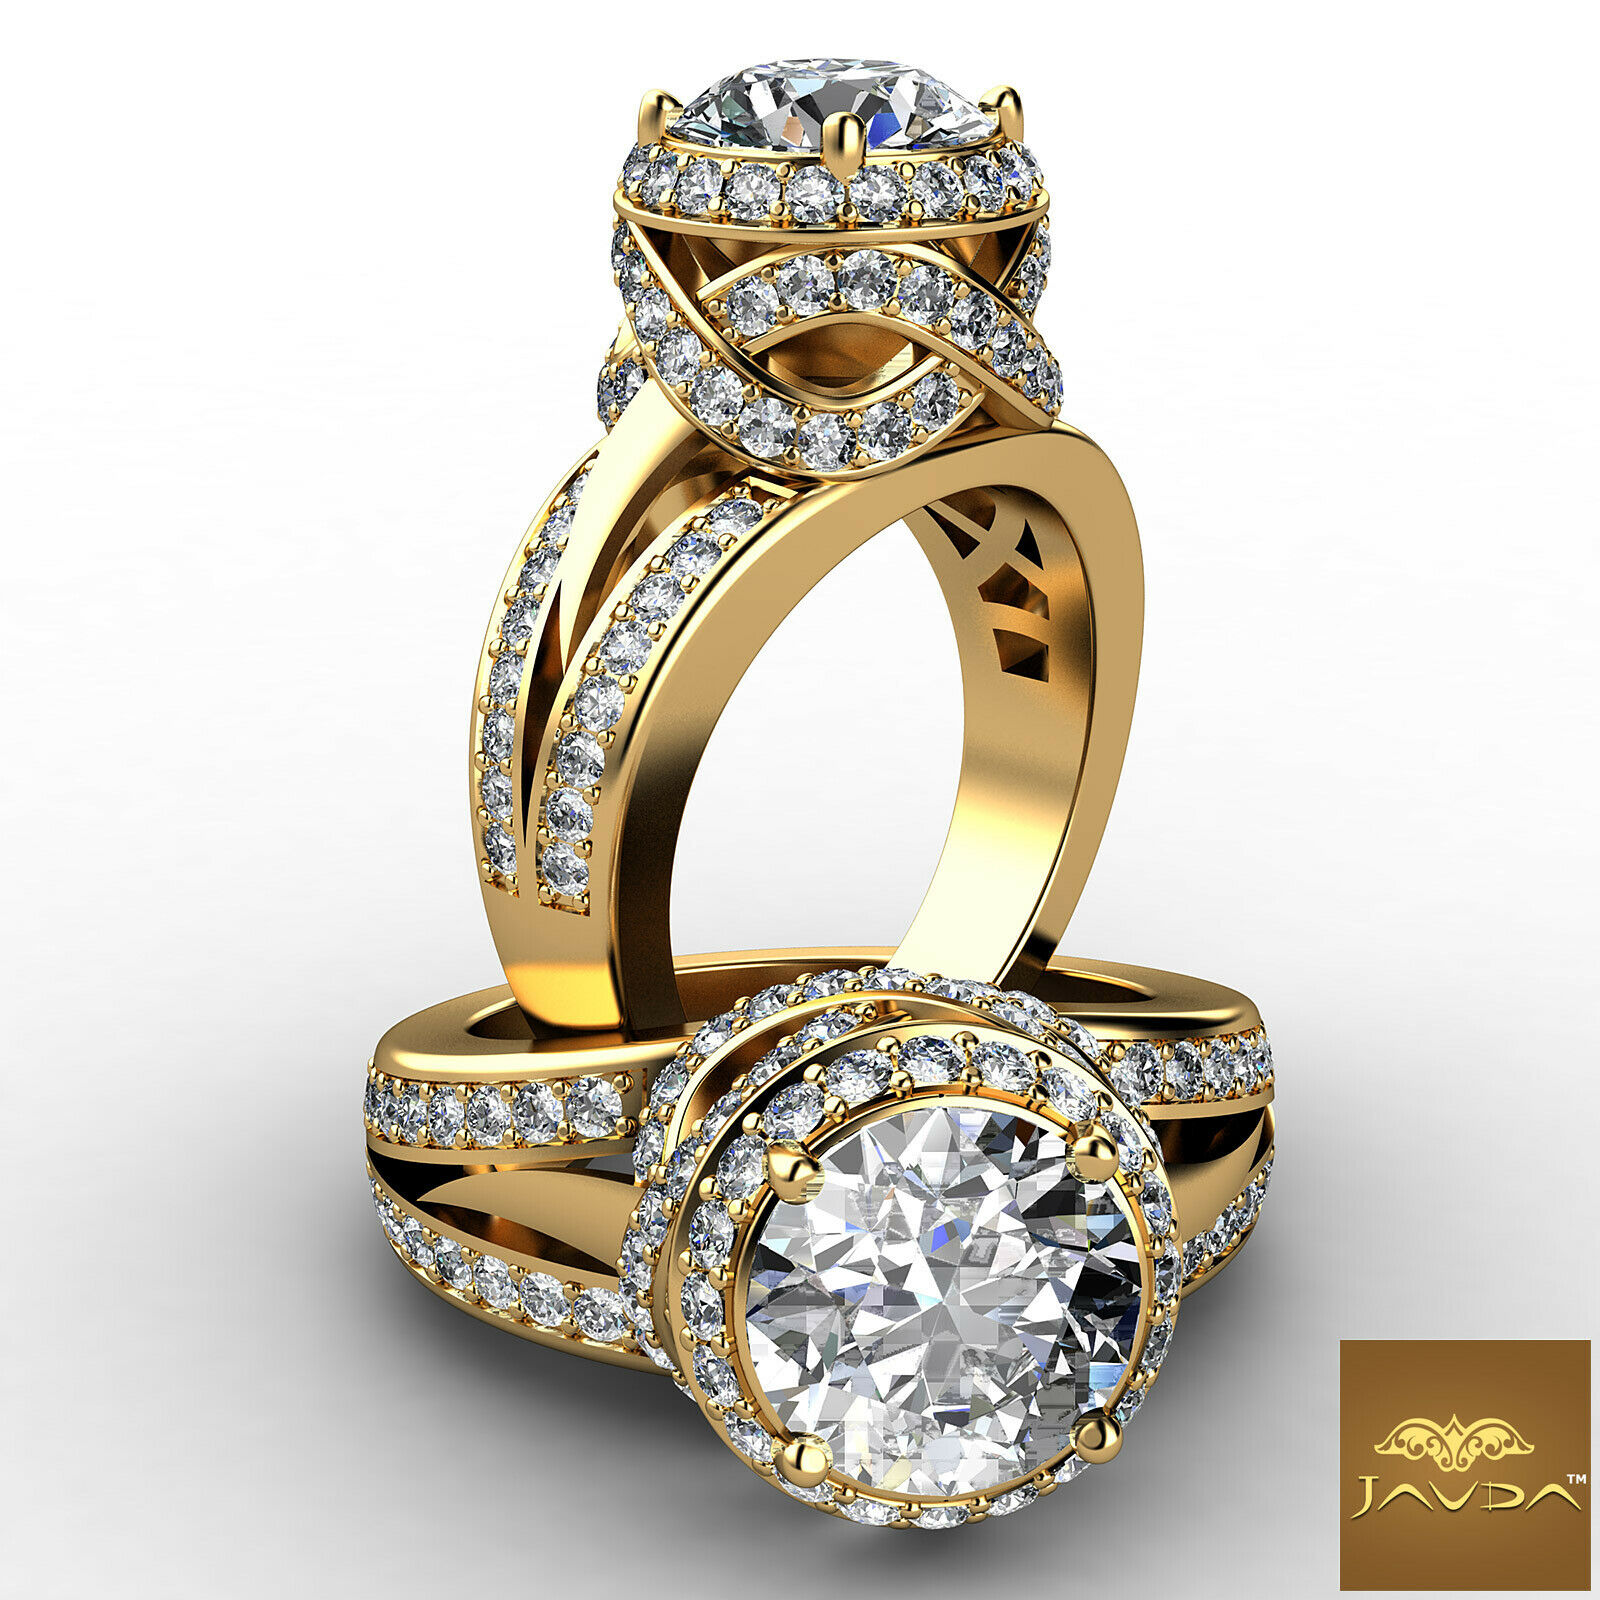 Antique Style Halo Round Diamond Engagement Ring GIA F VS2 18k Yellow Gold 2.8ct